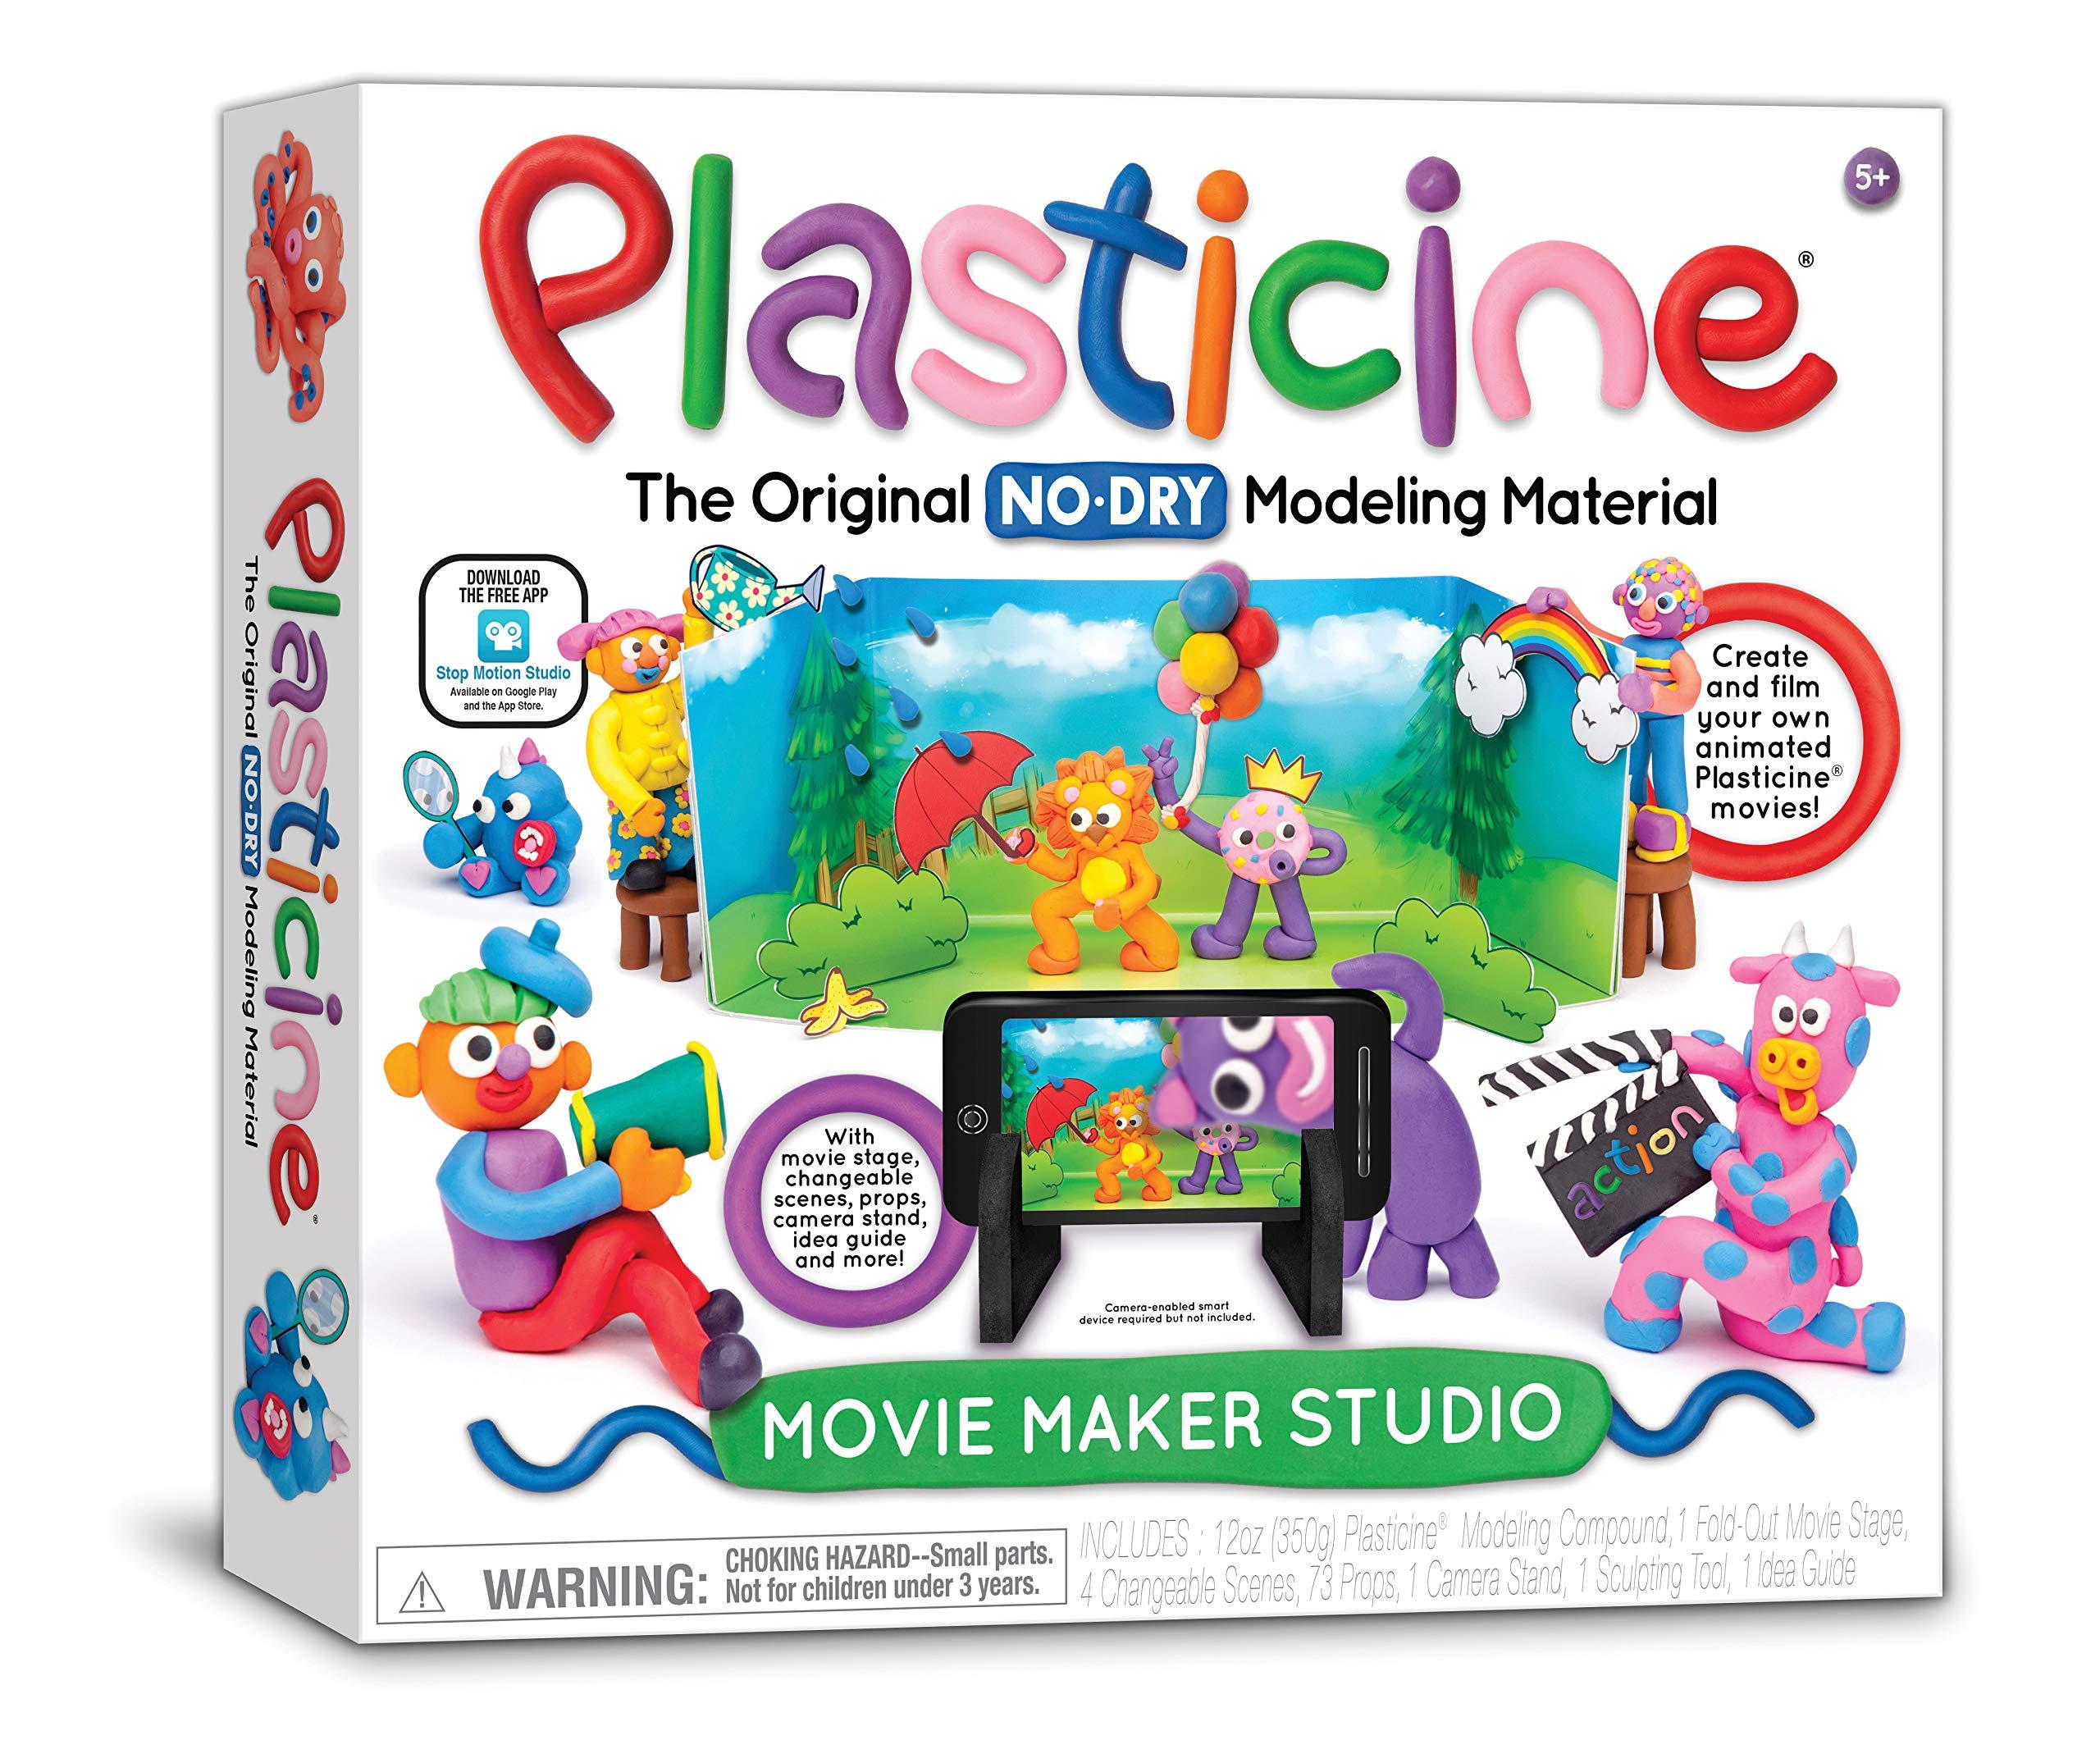 Plasticine Movie Maker Studio Toy, Multi-Colored